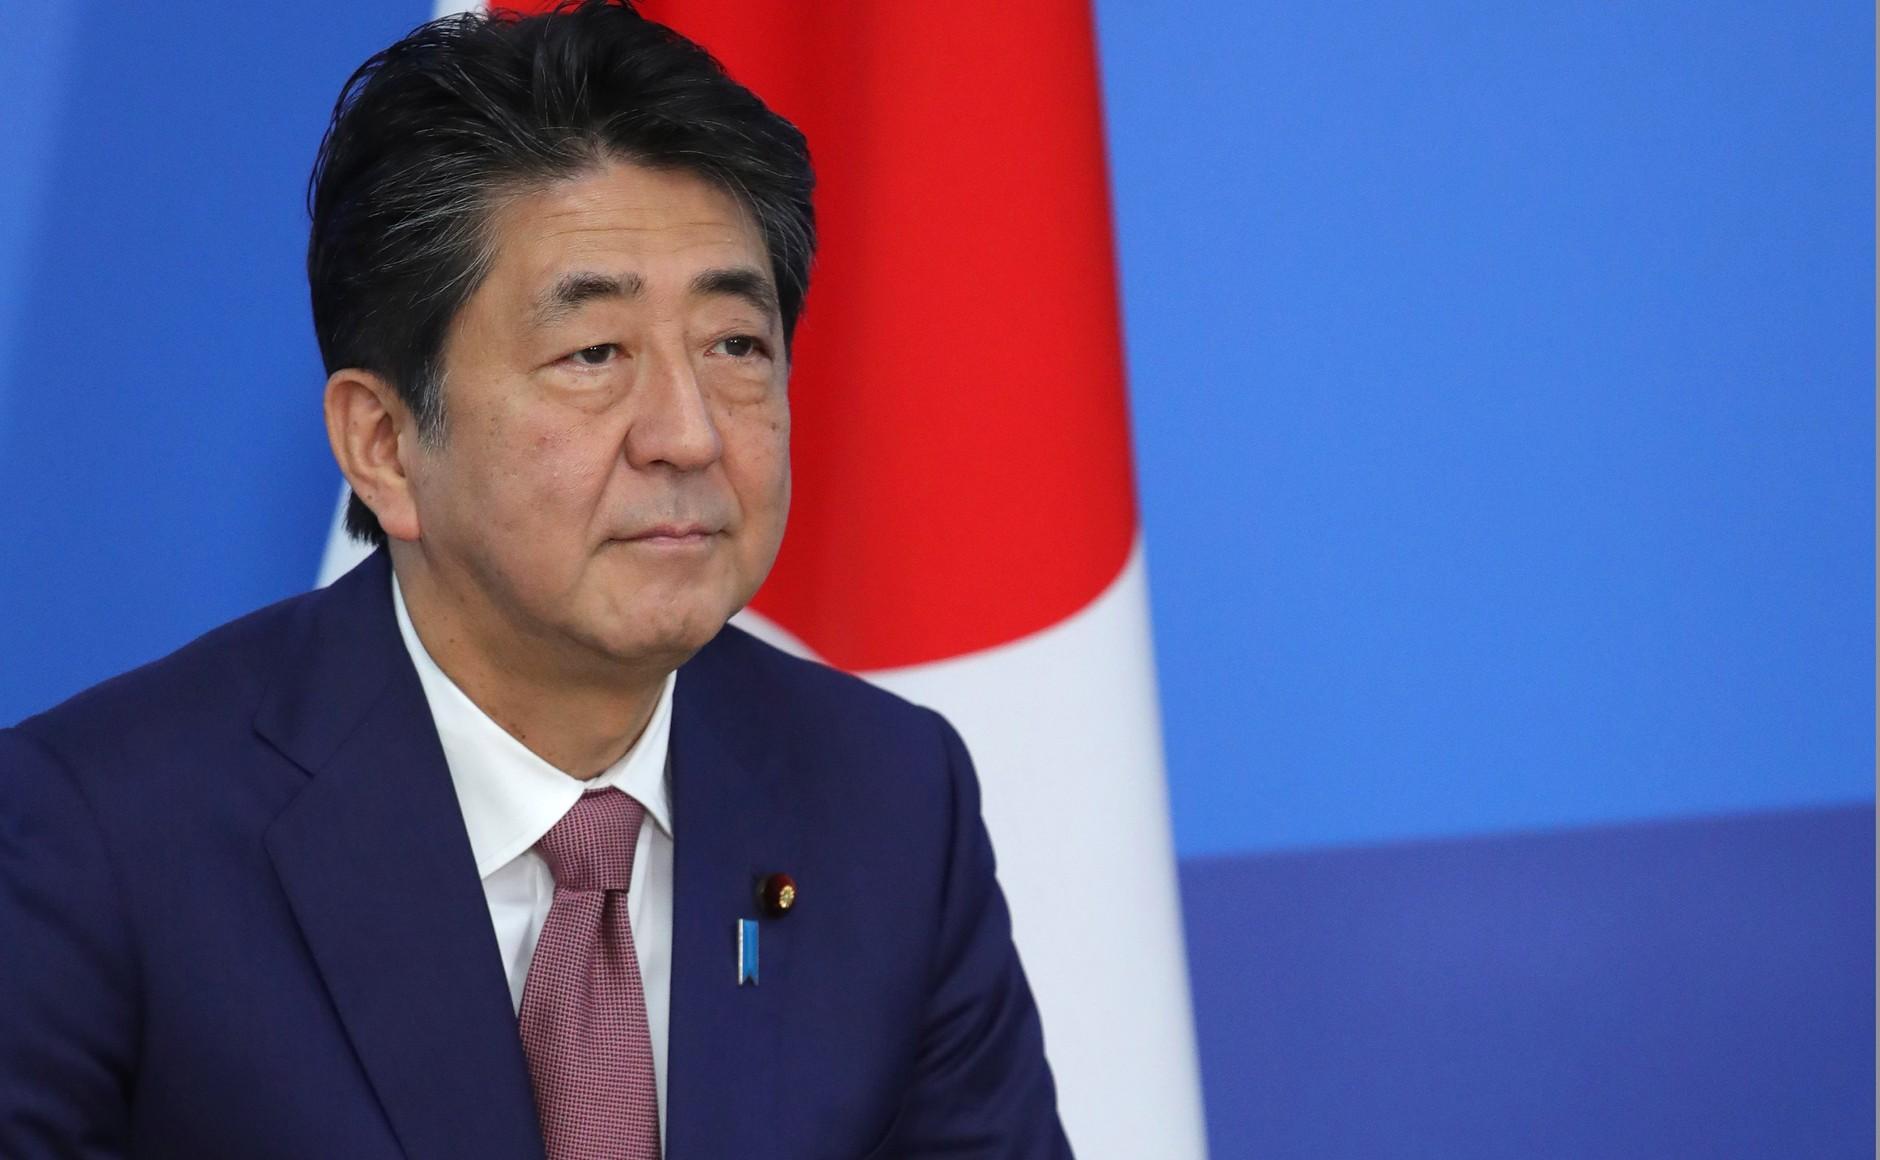 <p>Премьер-министр Японии Синдзо Абэ. Фото © Kremlin</p>